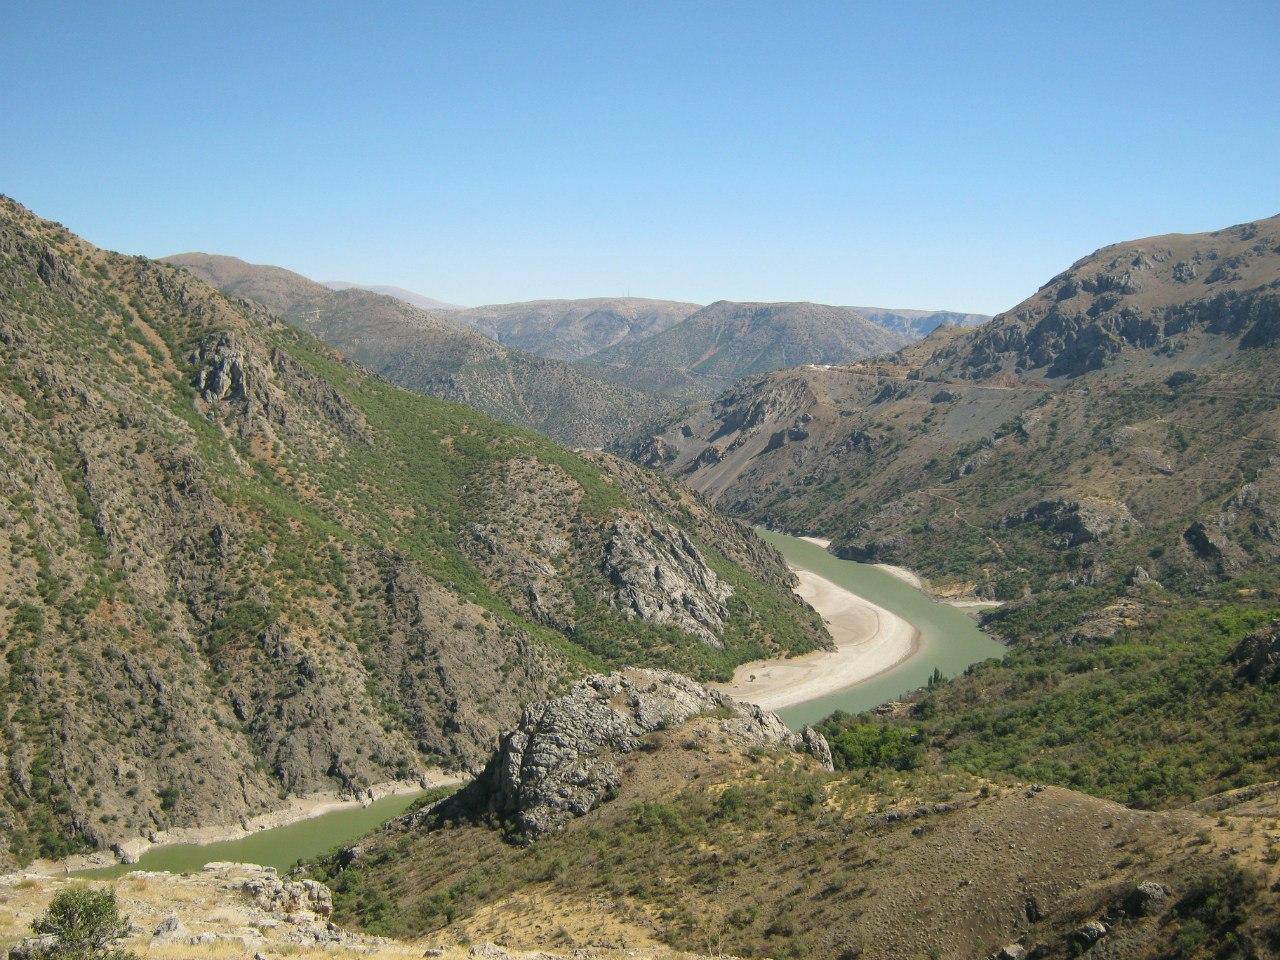 Красивая панорама турецких дорог